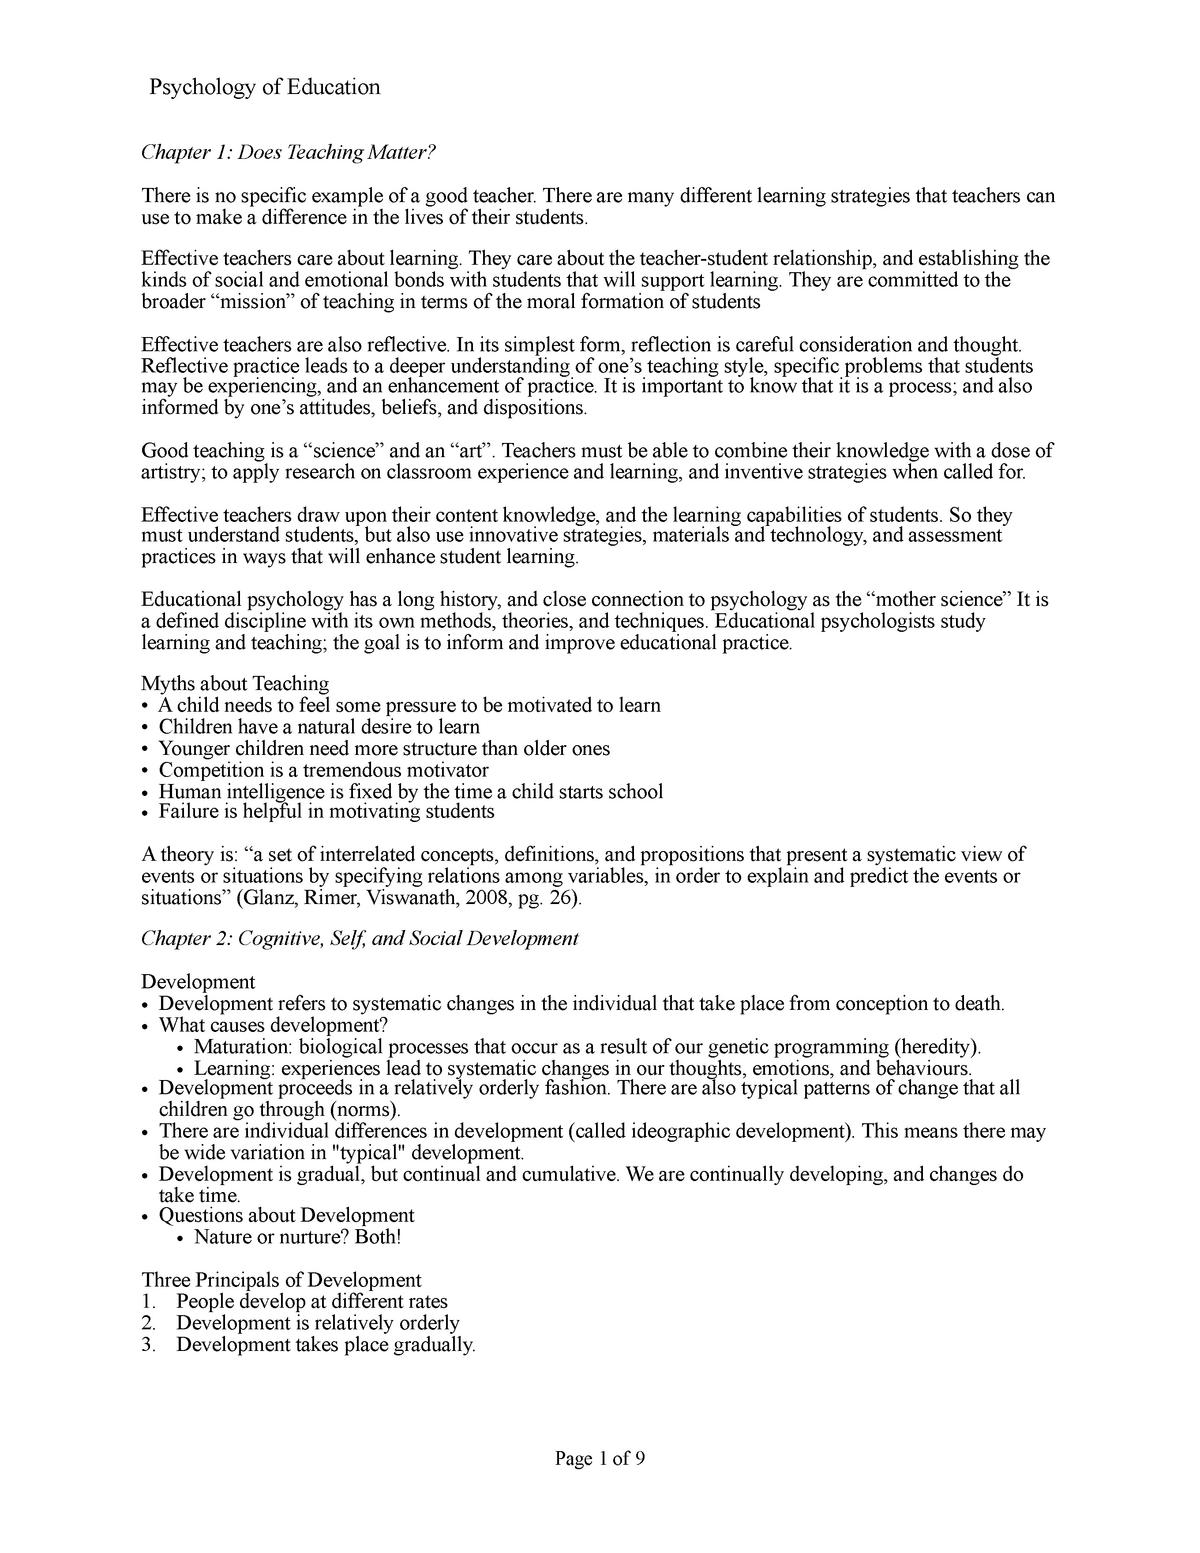 Psychology Of Education - Course Summary - PSYC-3406EL